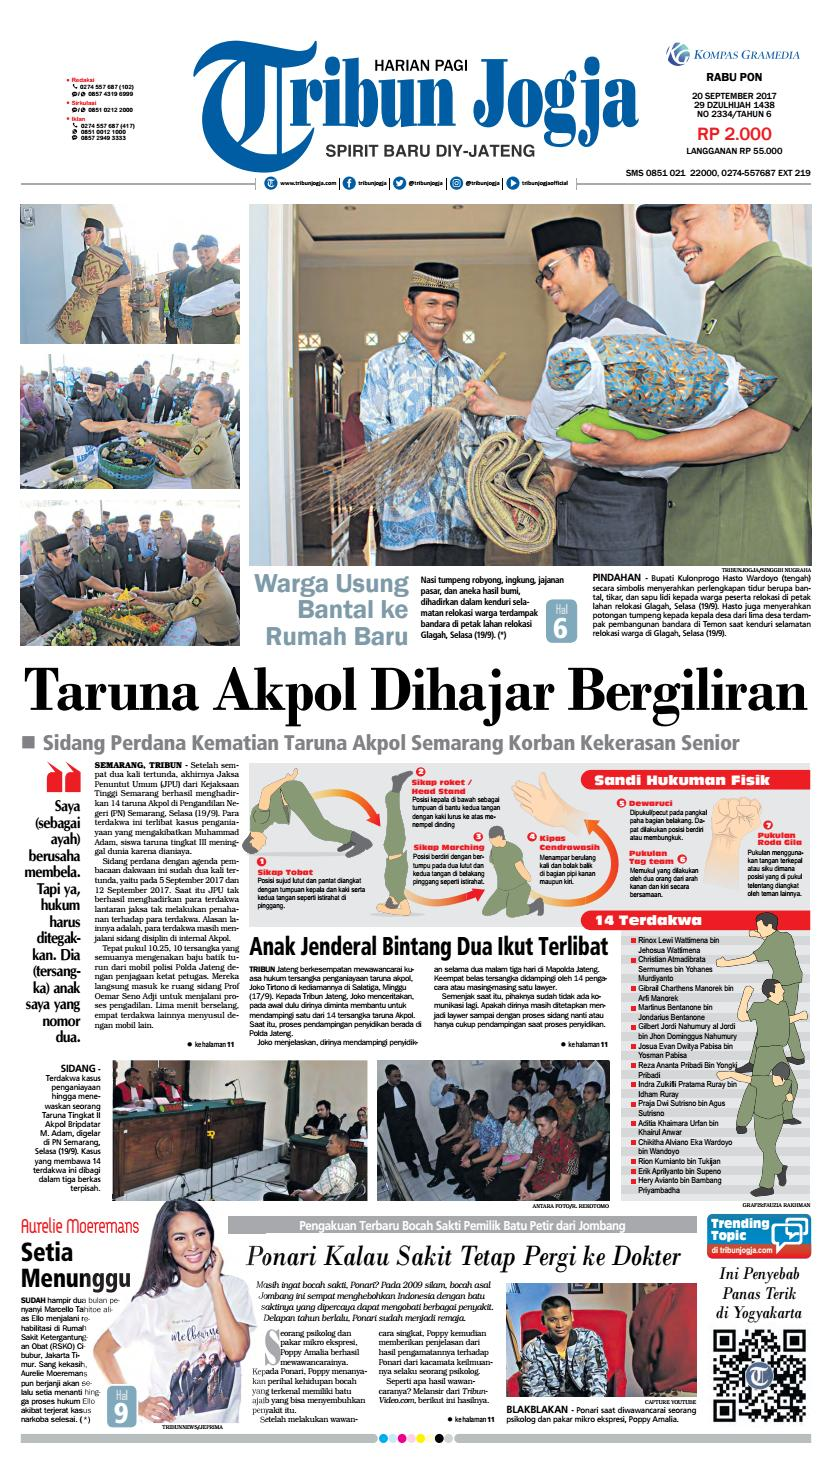 Tribunjogja 20 09 2017 By Tribun Jogja Issuu Produk Ukm Bumn Batik Tulis Warna Alam Ra Ampamp